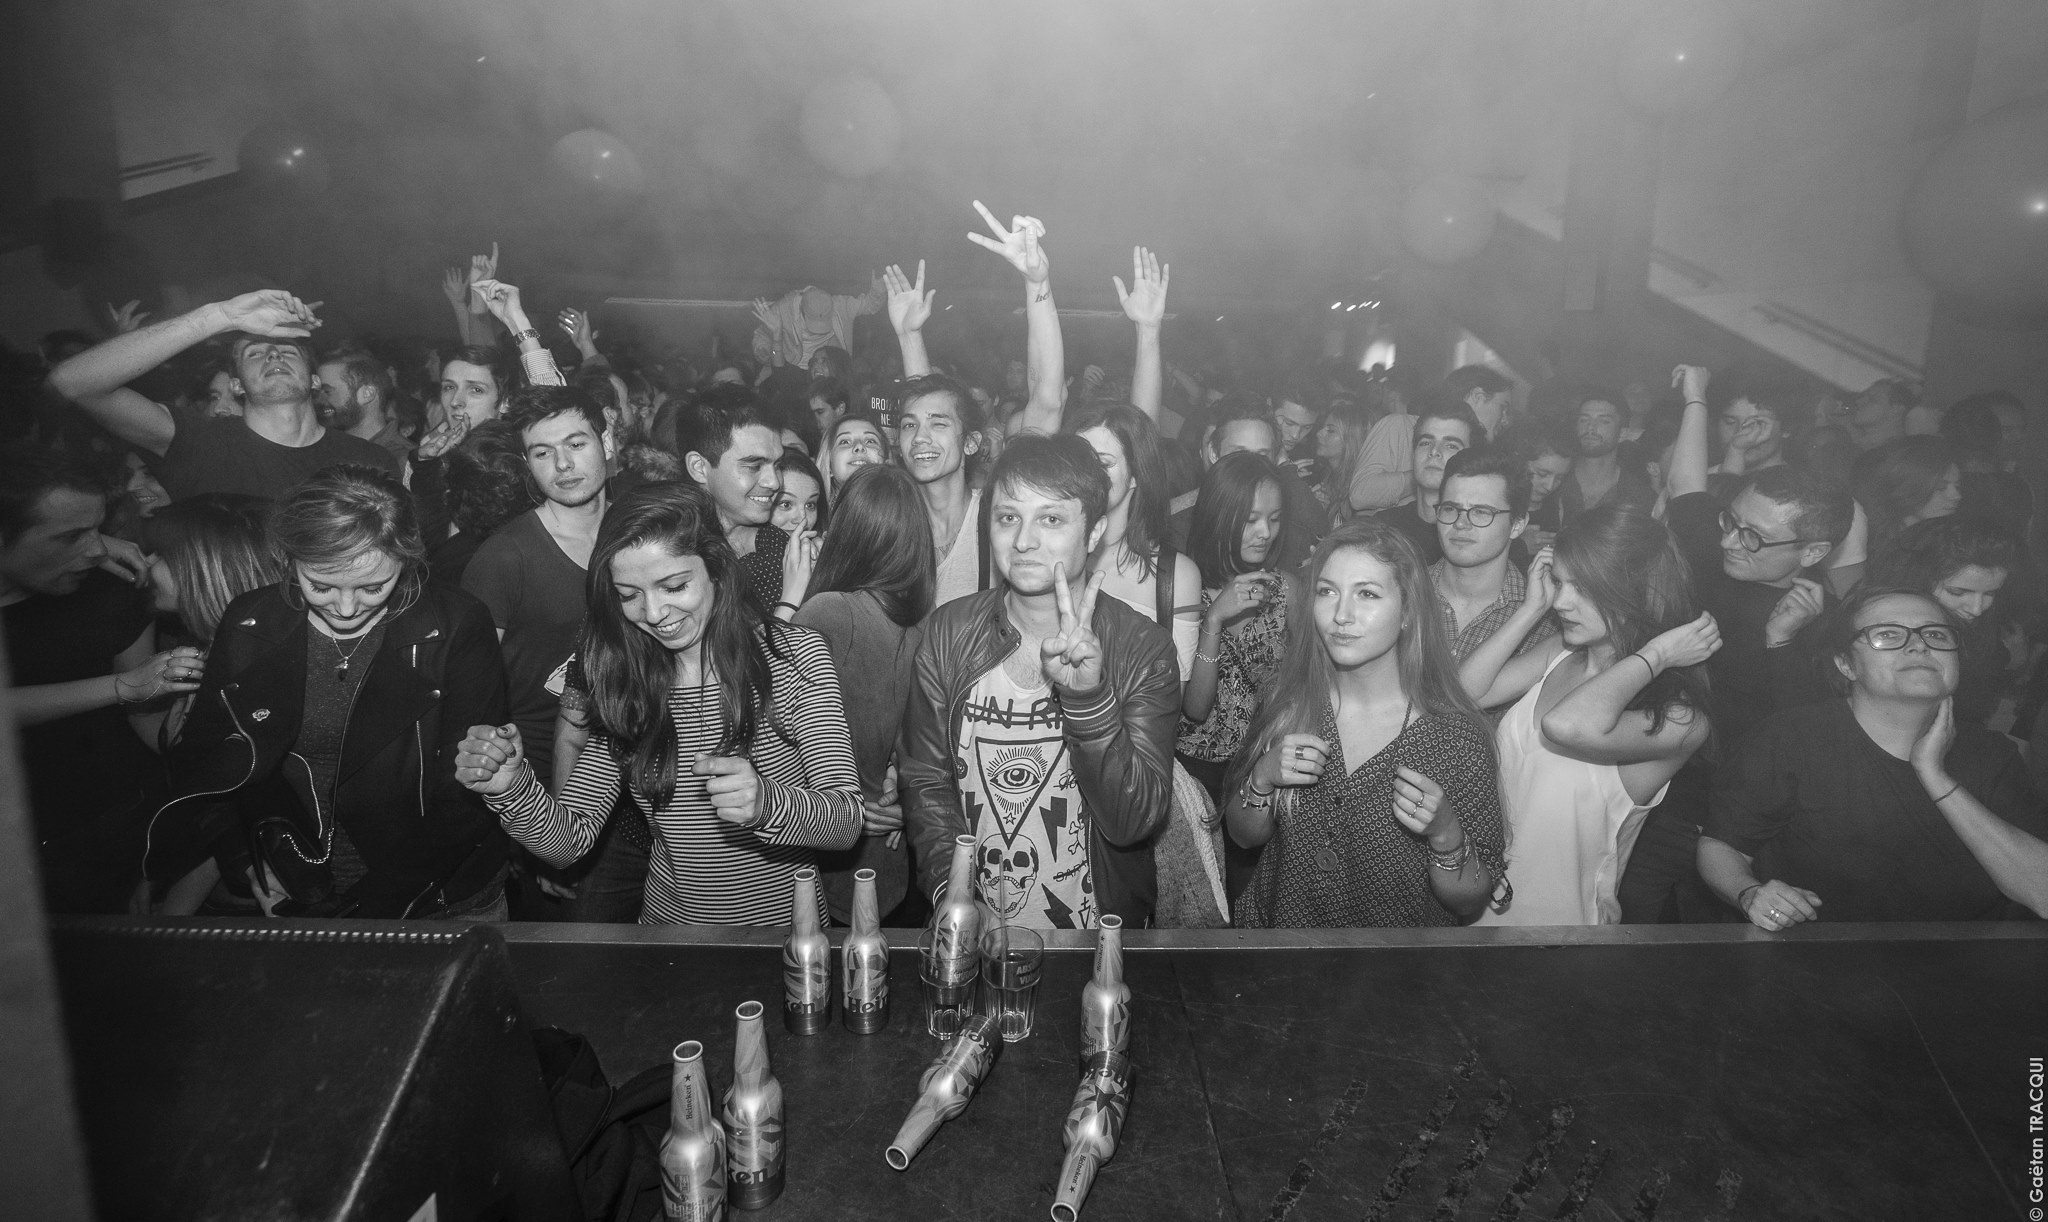 Trentemøller* Trentemoller·& T.O.M* DJ Tom·/ Vildtand Feat. Trentemøller* Trentemoller·, Krede & Buda - An Evening With Bobi Bros / 25 Timer